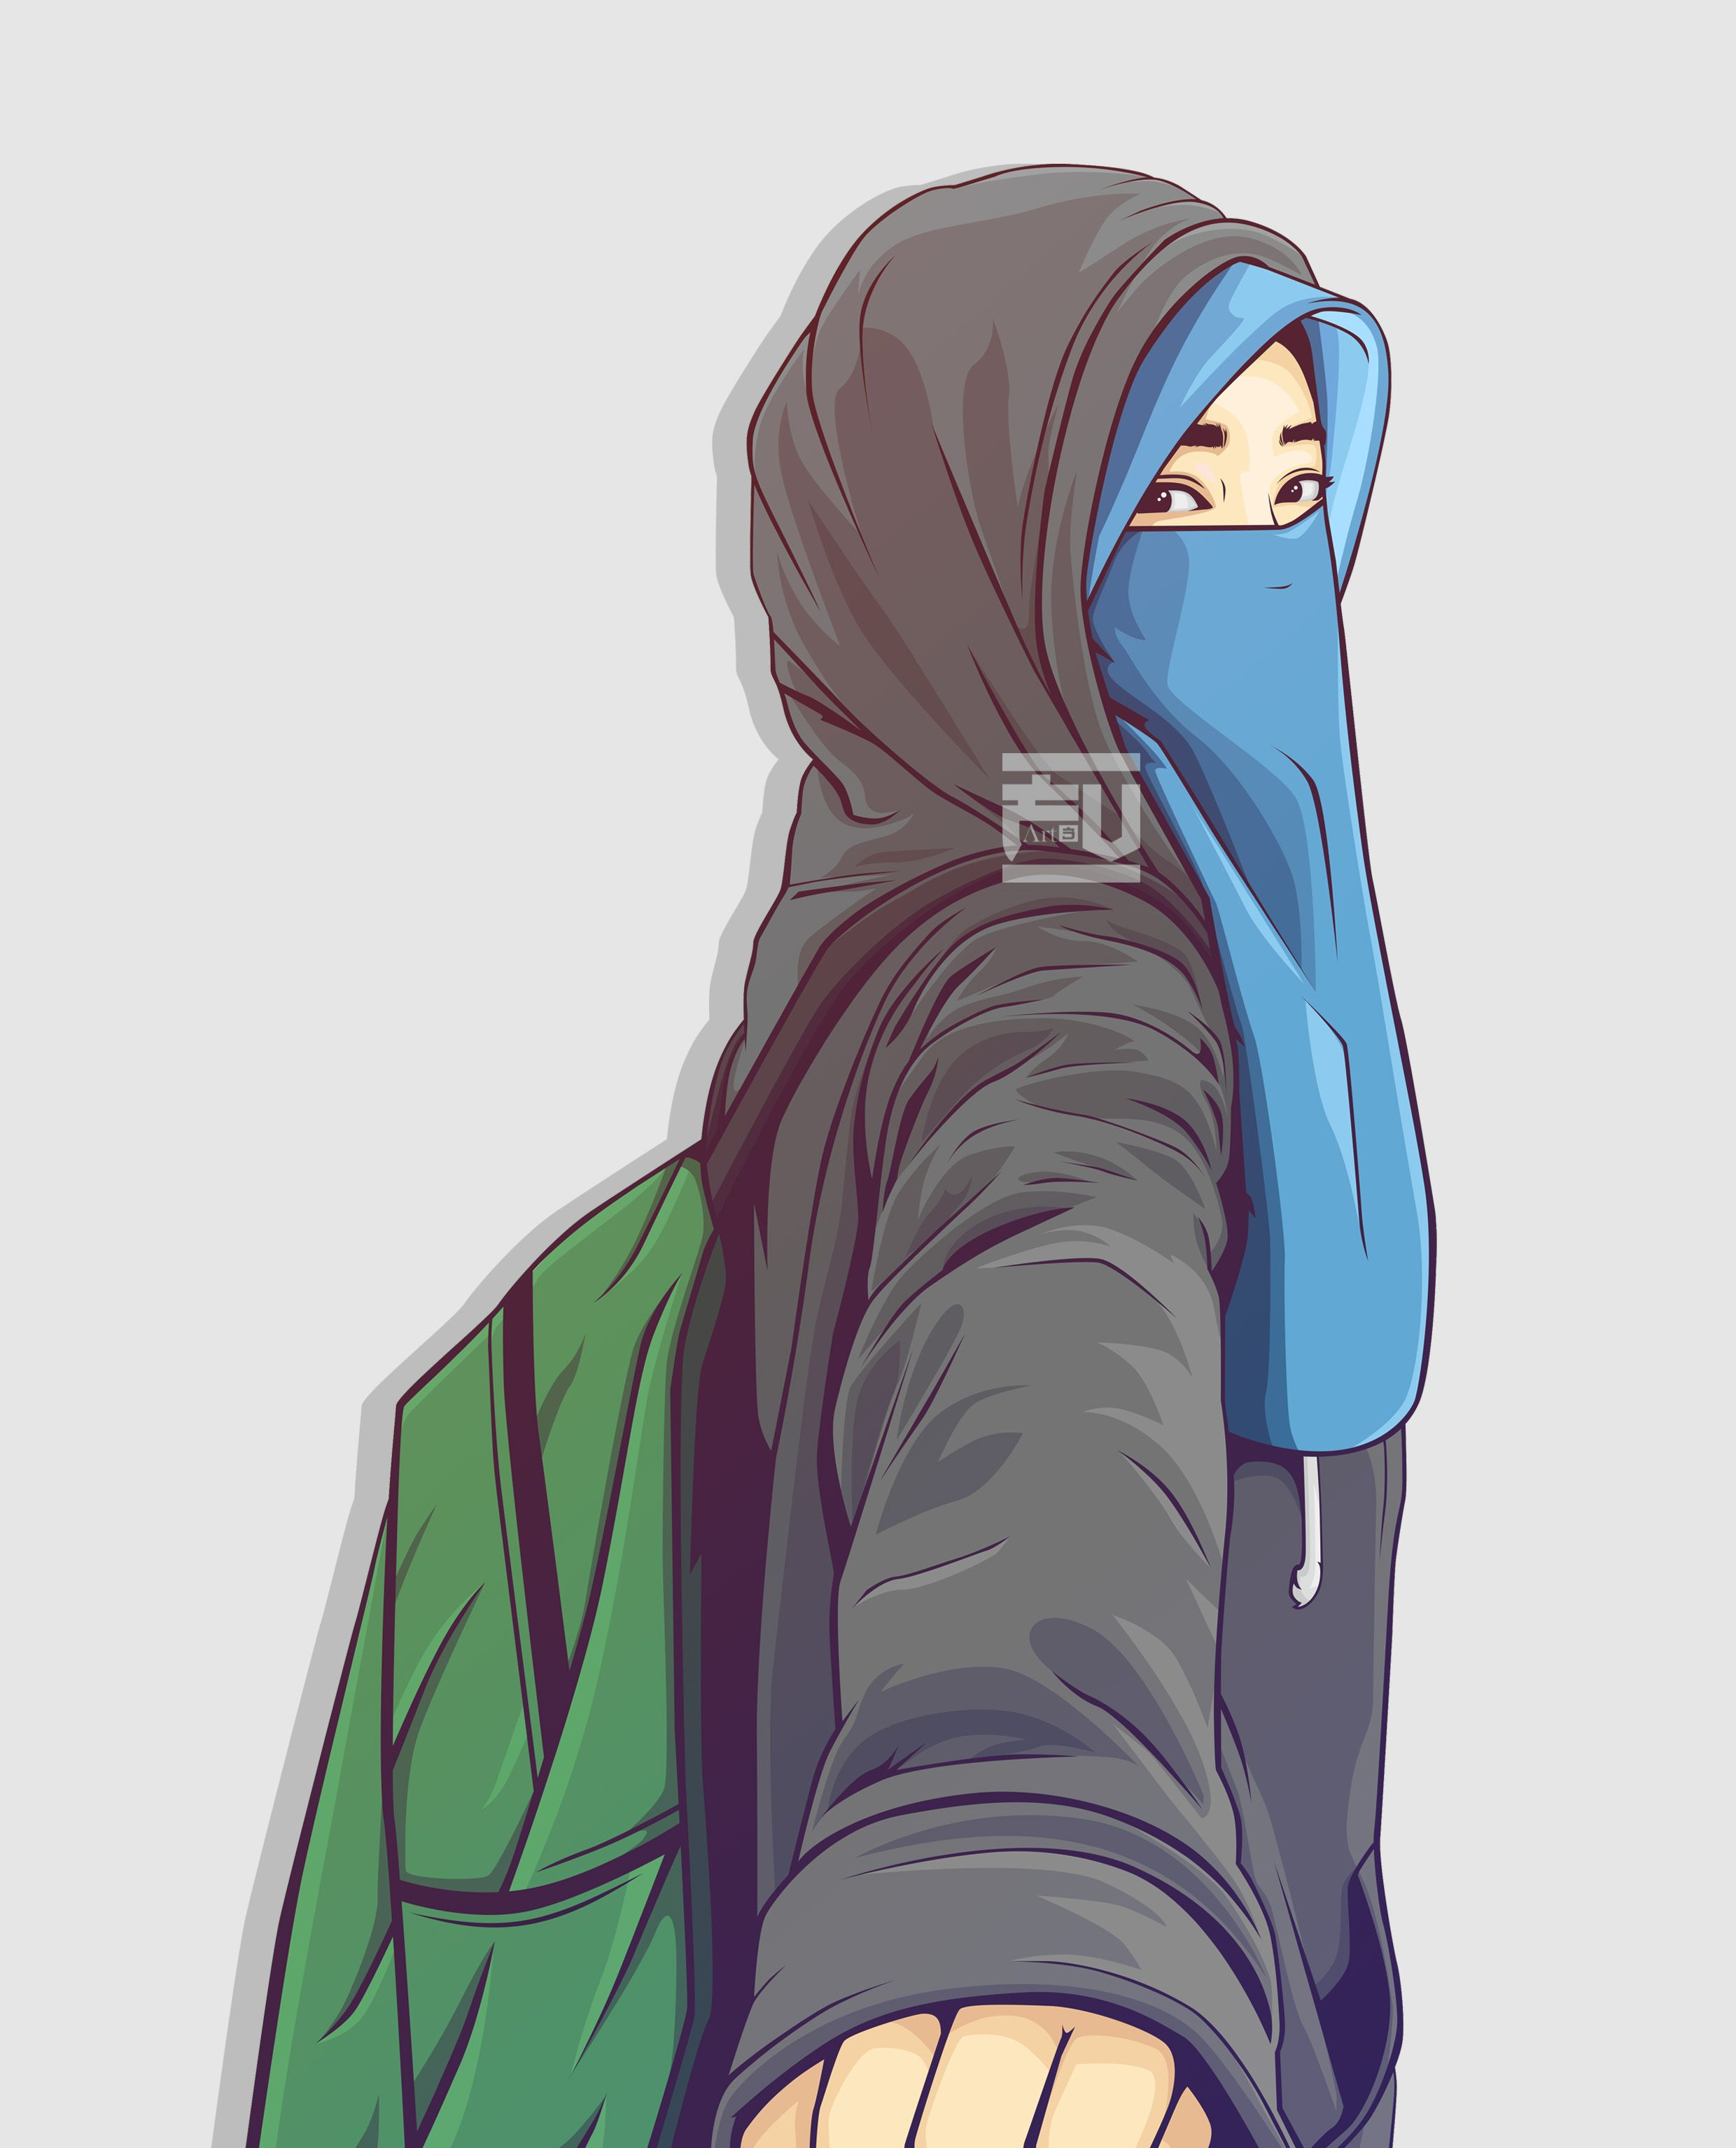 Foto Kartun Perempuan Hijab Gokil Abis